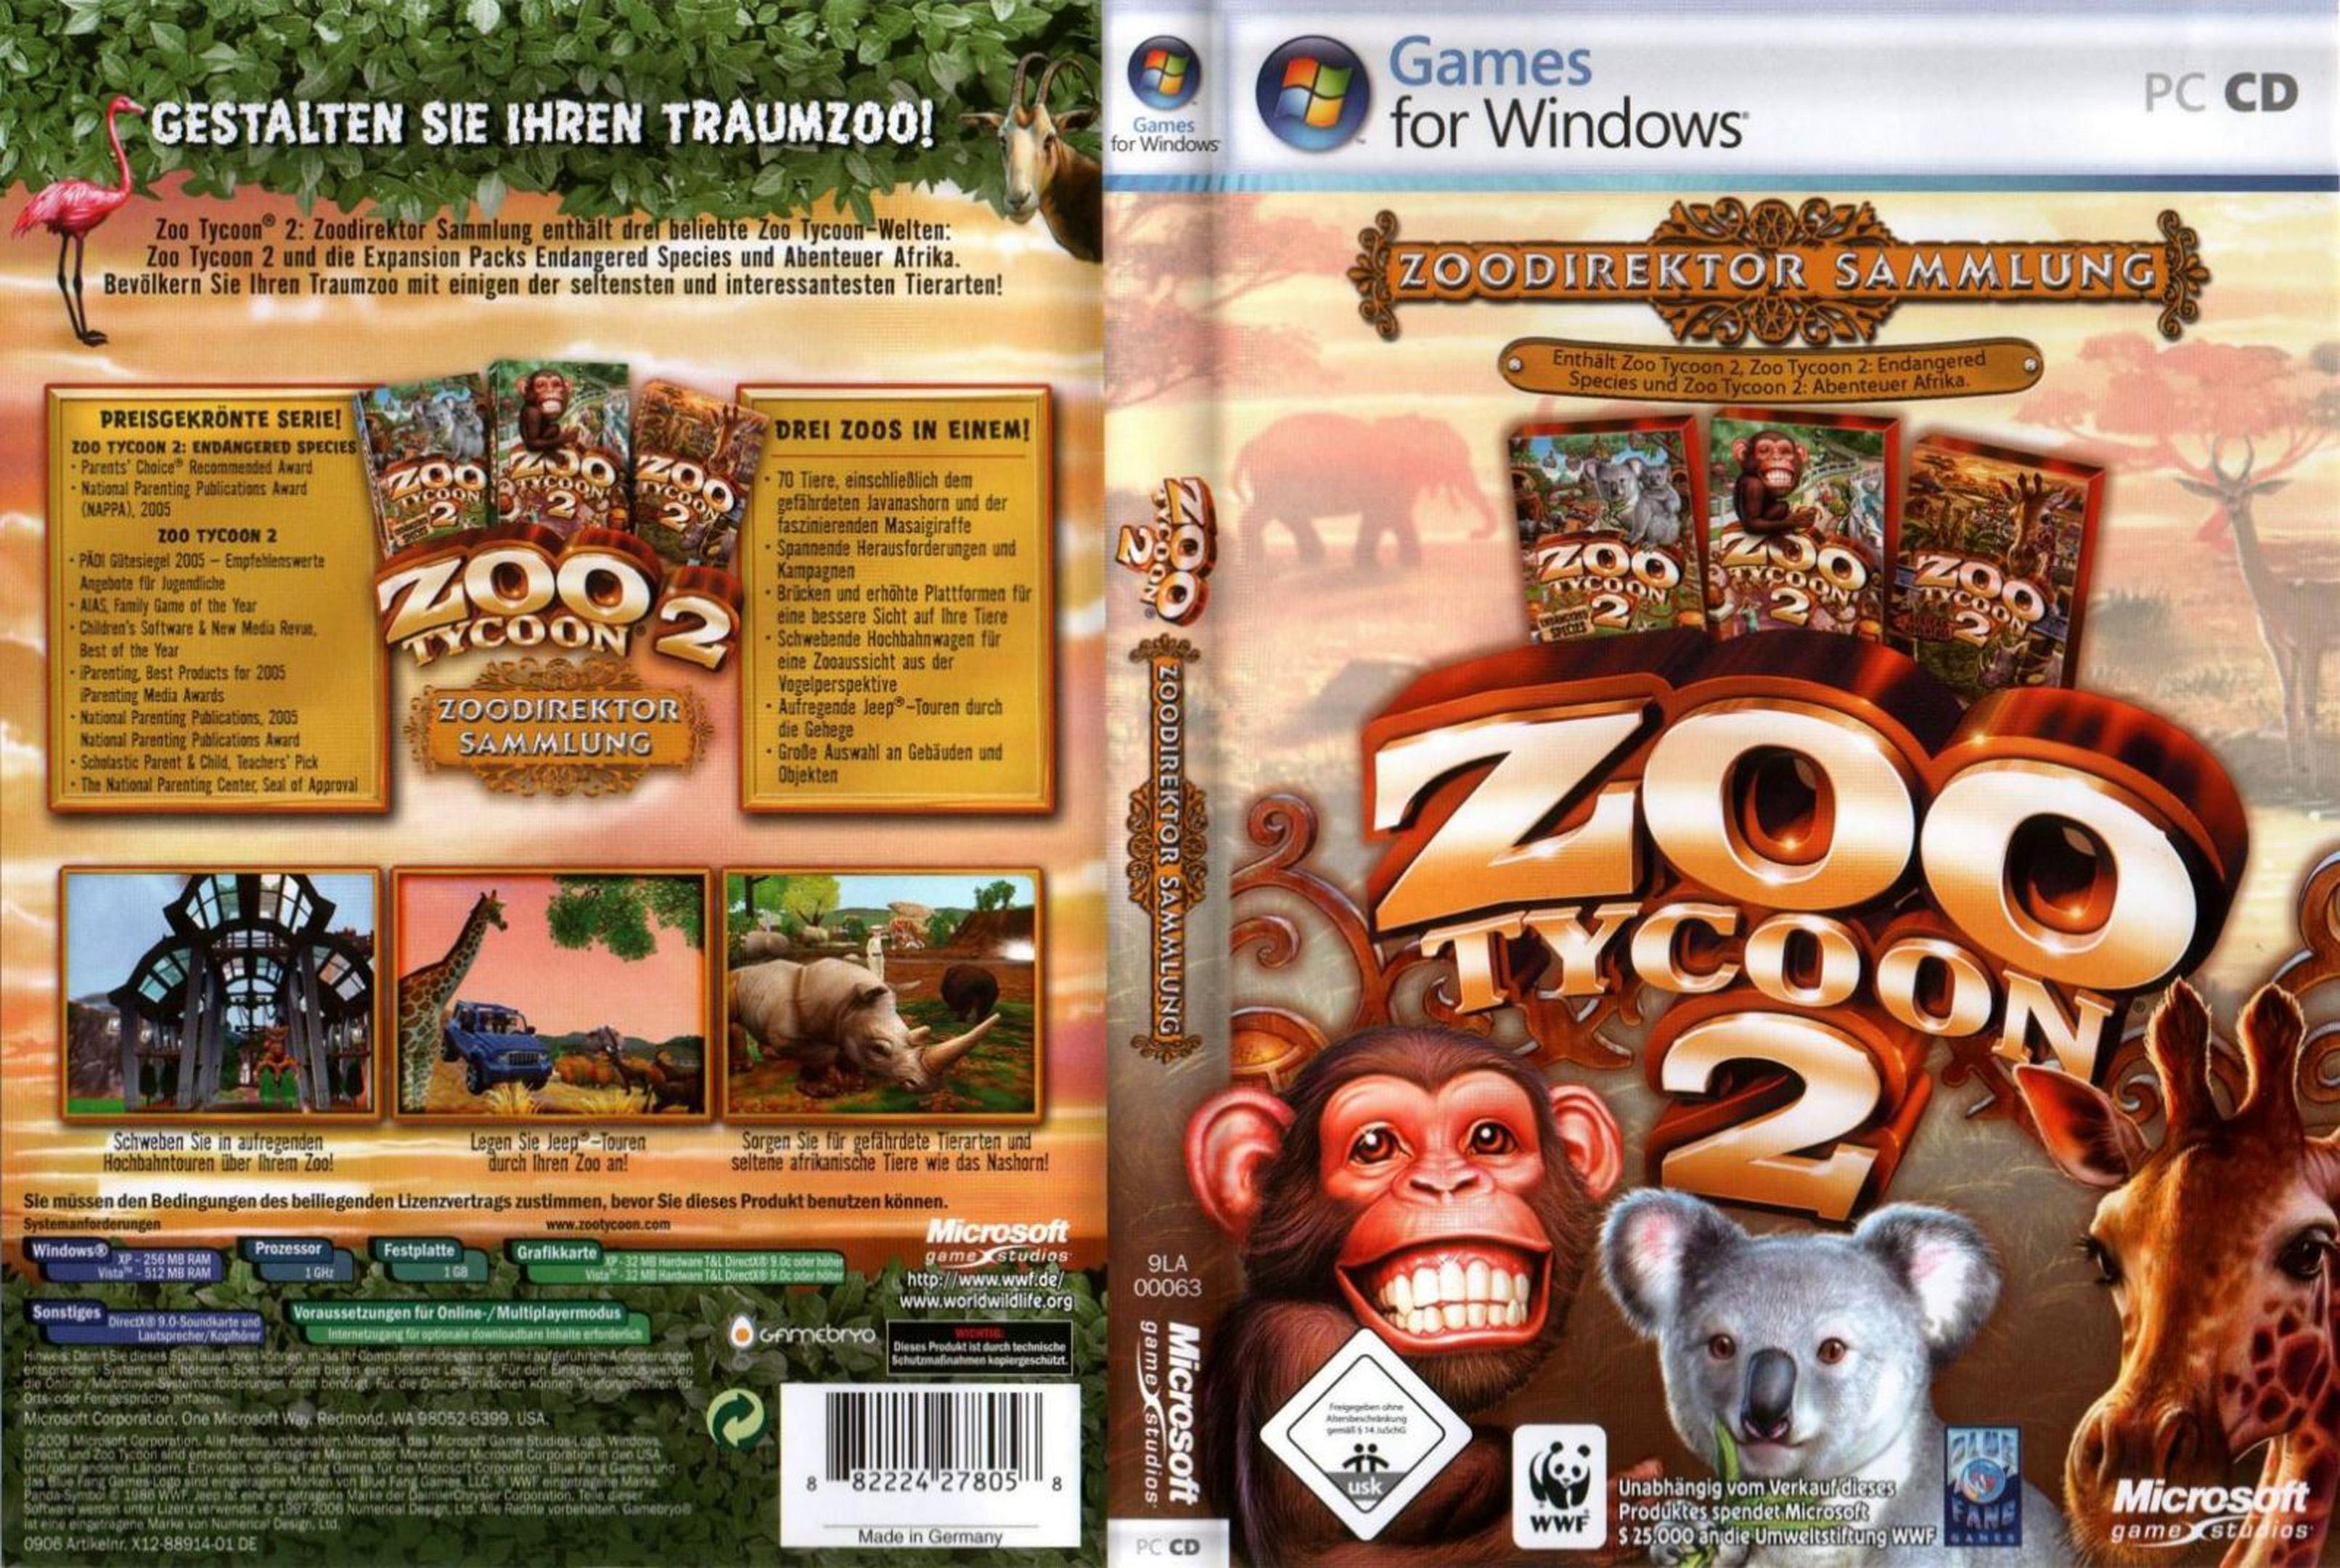 zoo tycoon 2 pc: